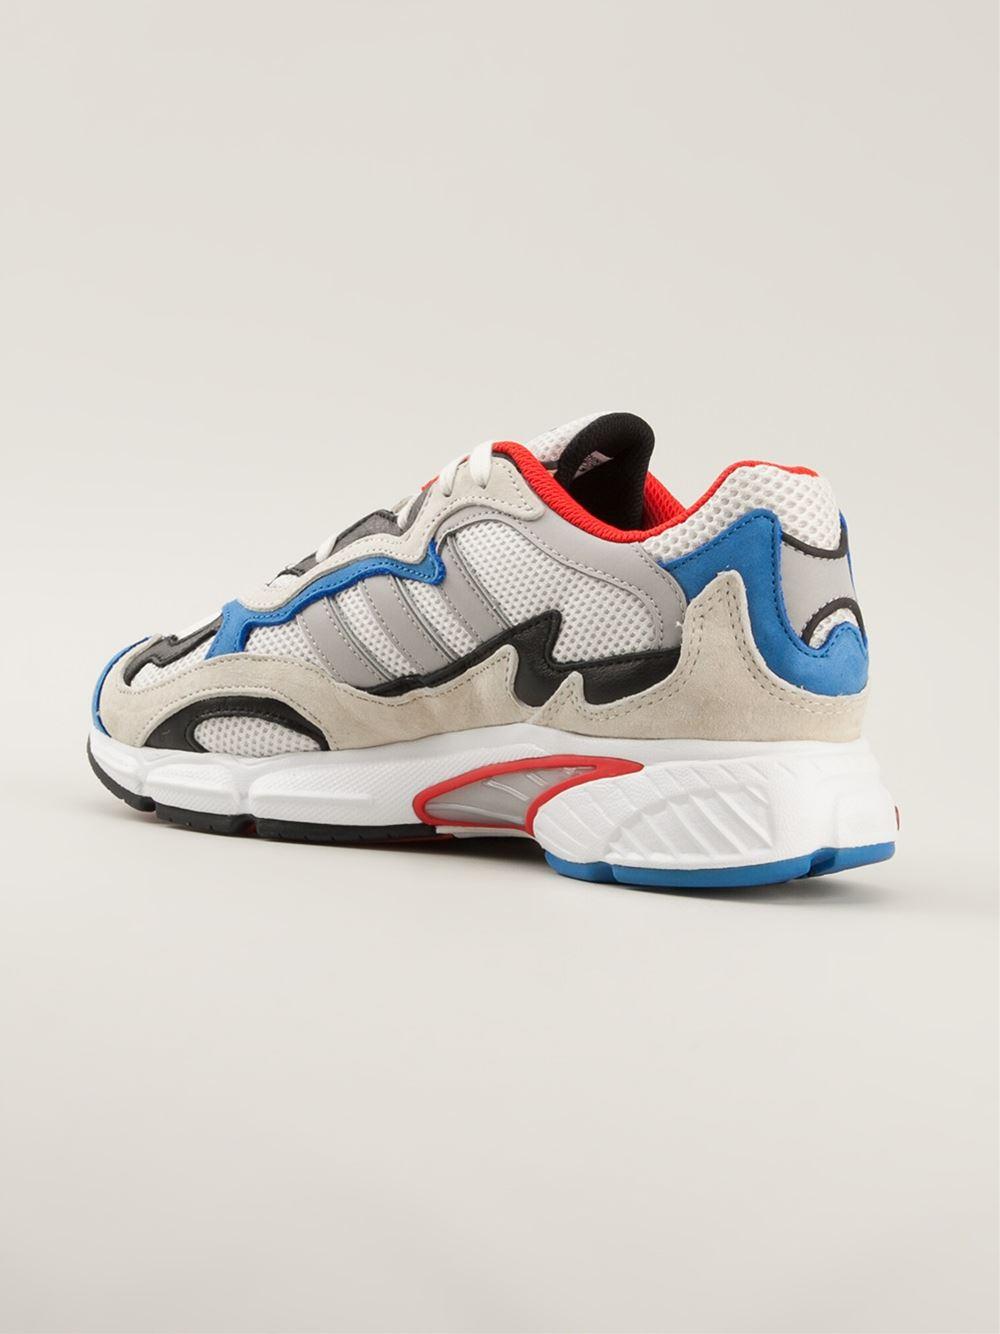 6b49e3536d43 Lyst - Adidas Temper Run Sneakers in White for Men ...